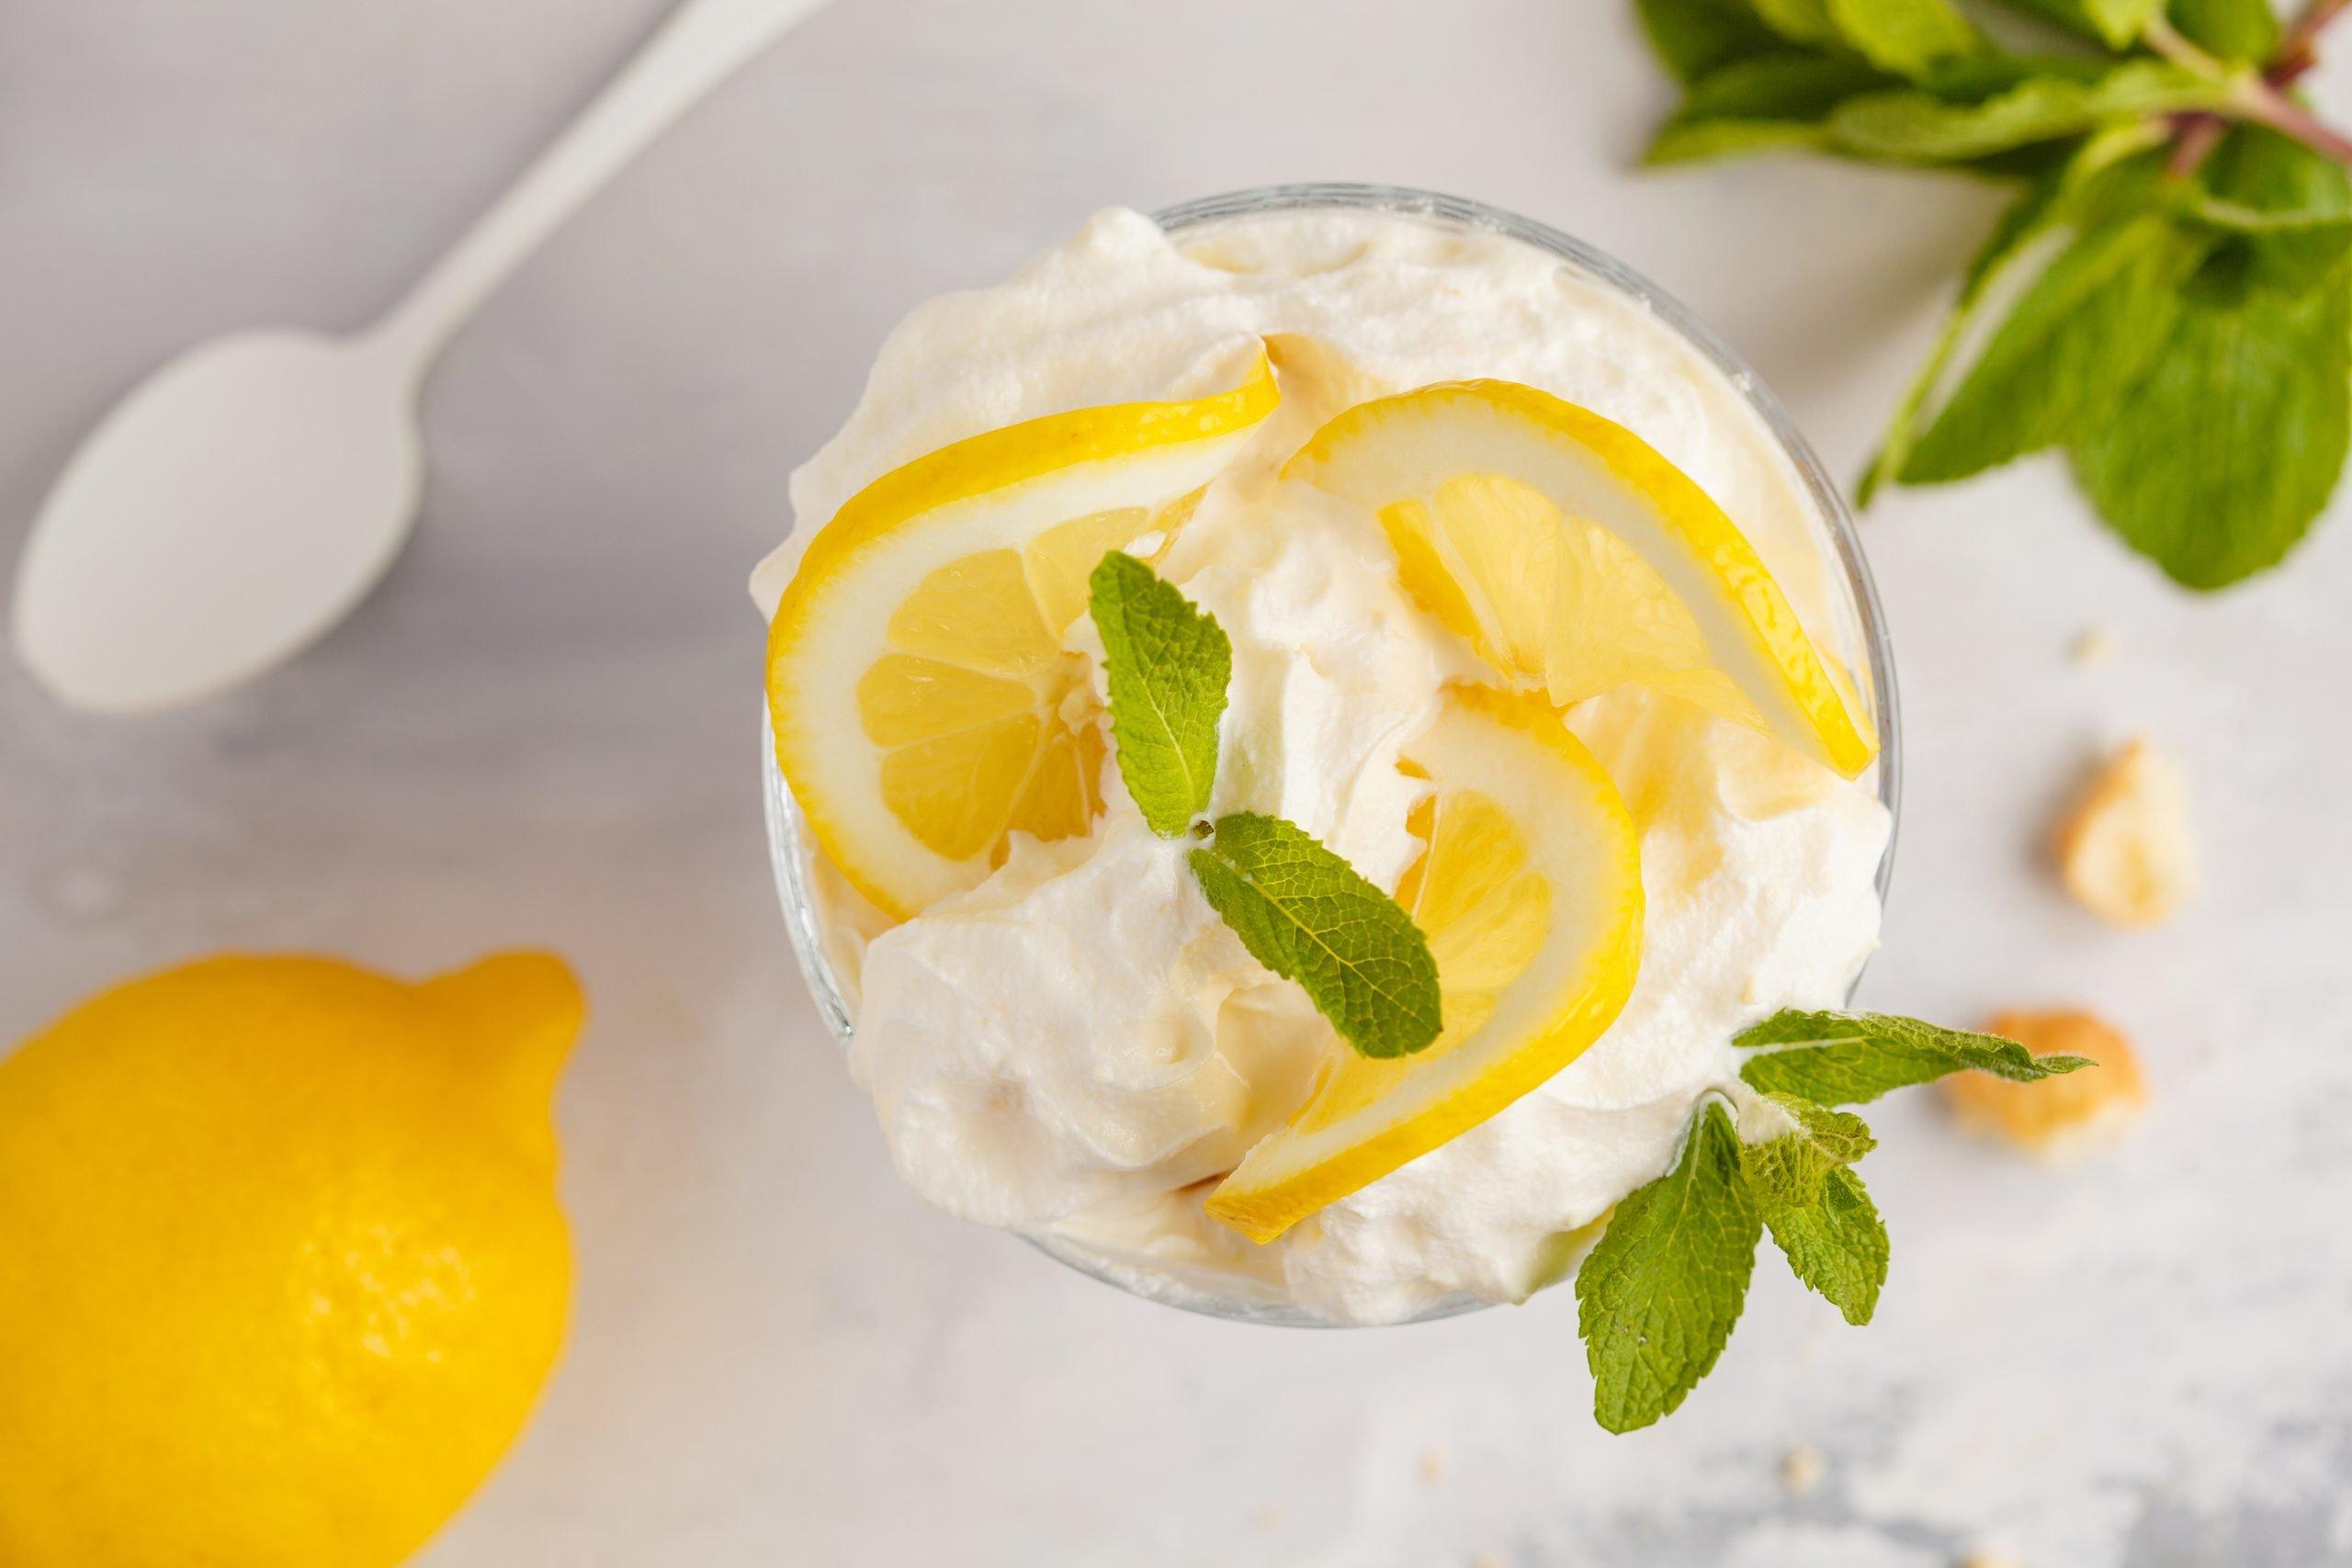 Delicious Tart Lemony Parfait with Whipped Cream Recipe